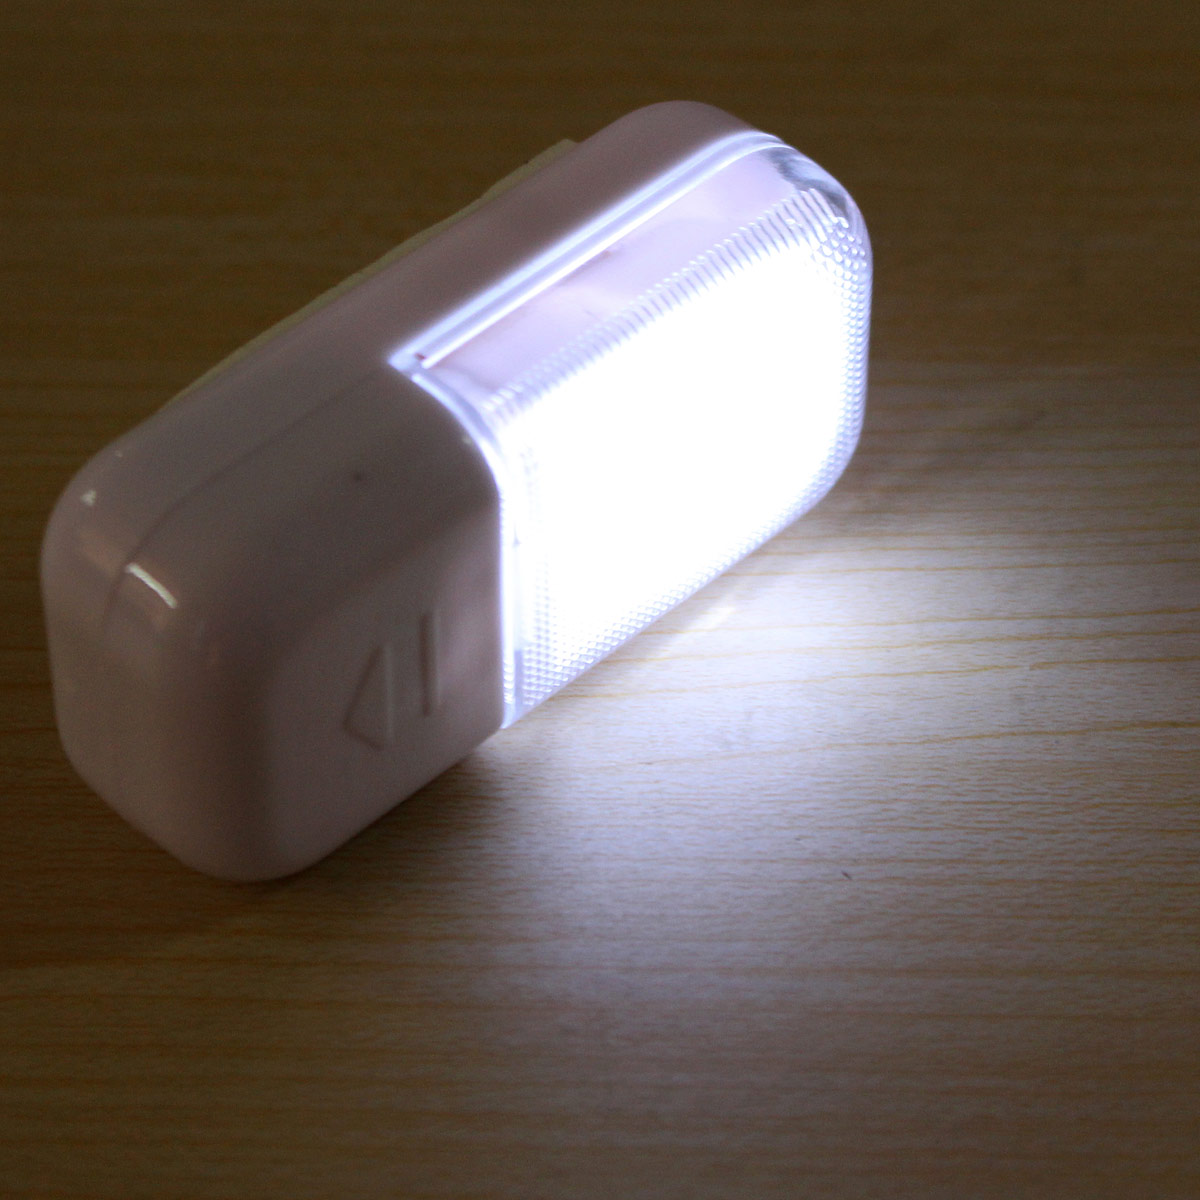 Jiguoor Mini Night light Wireless Automatic LED Magnetic Sensor Closet Lamp Bright easy to install for Wardrobe Cupboard Cabinet